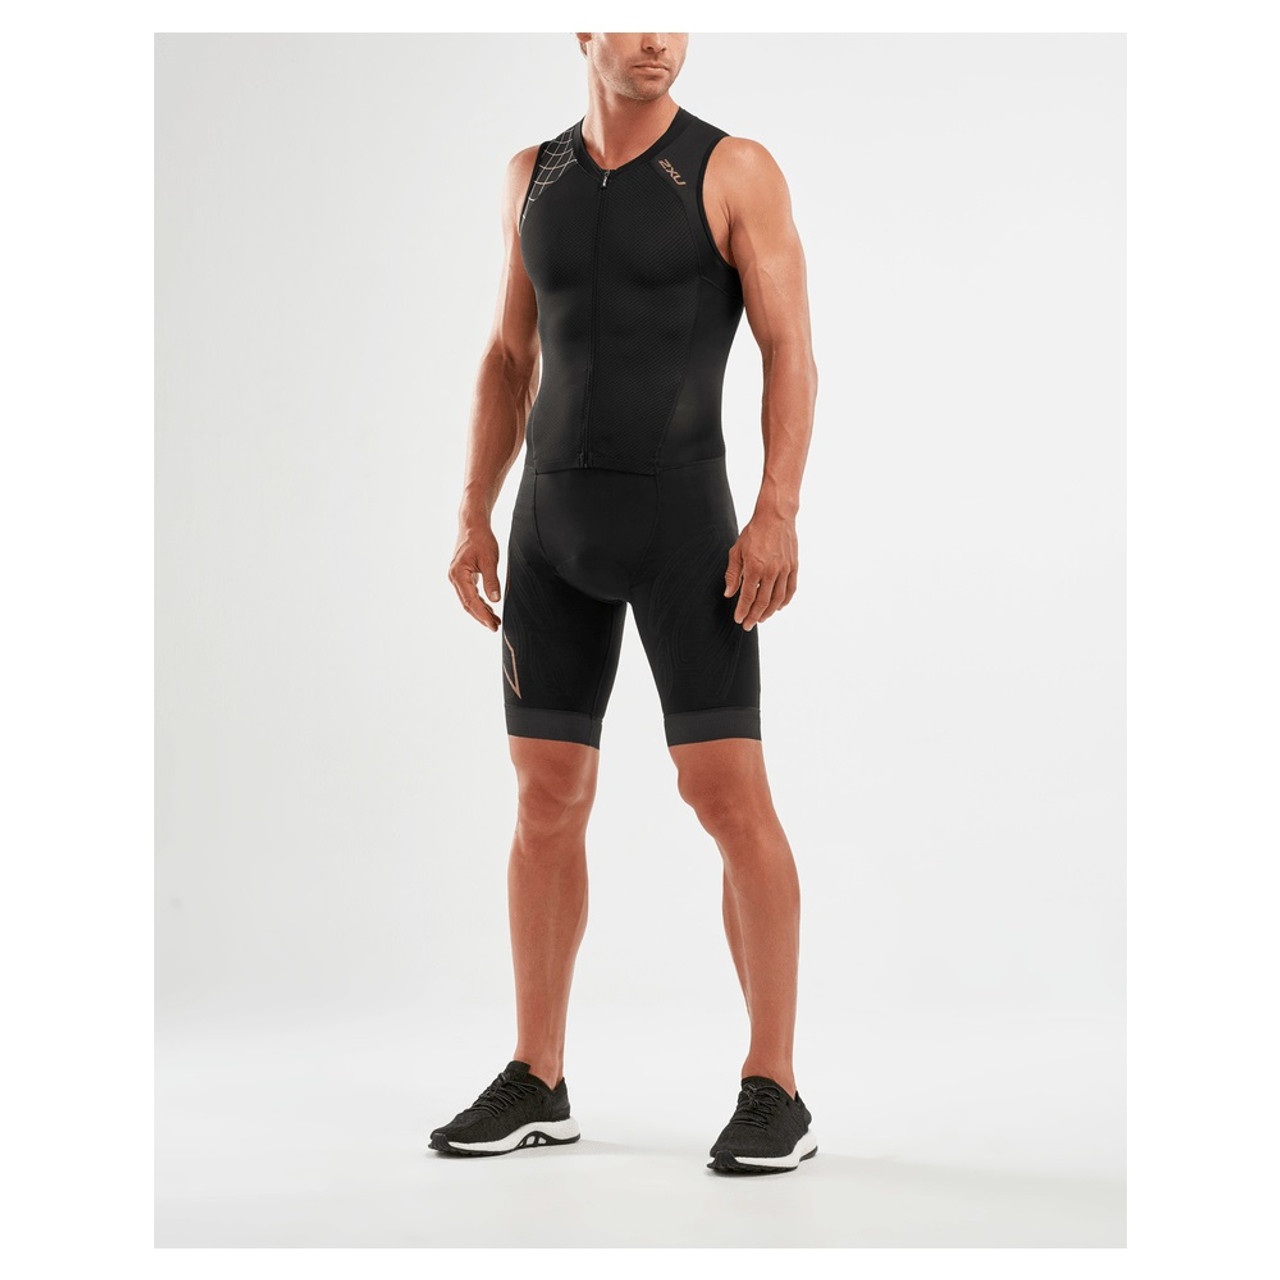 New 2XU Men Compression Full Zip Trisuit Black All Sizes MT5517d